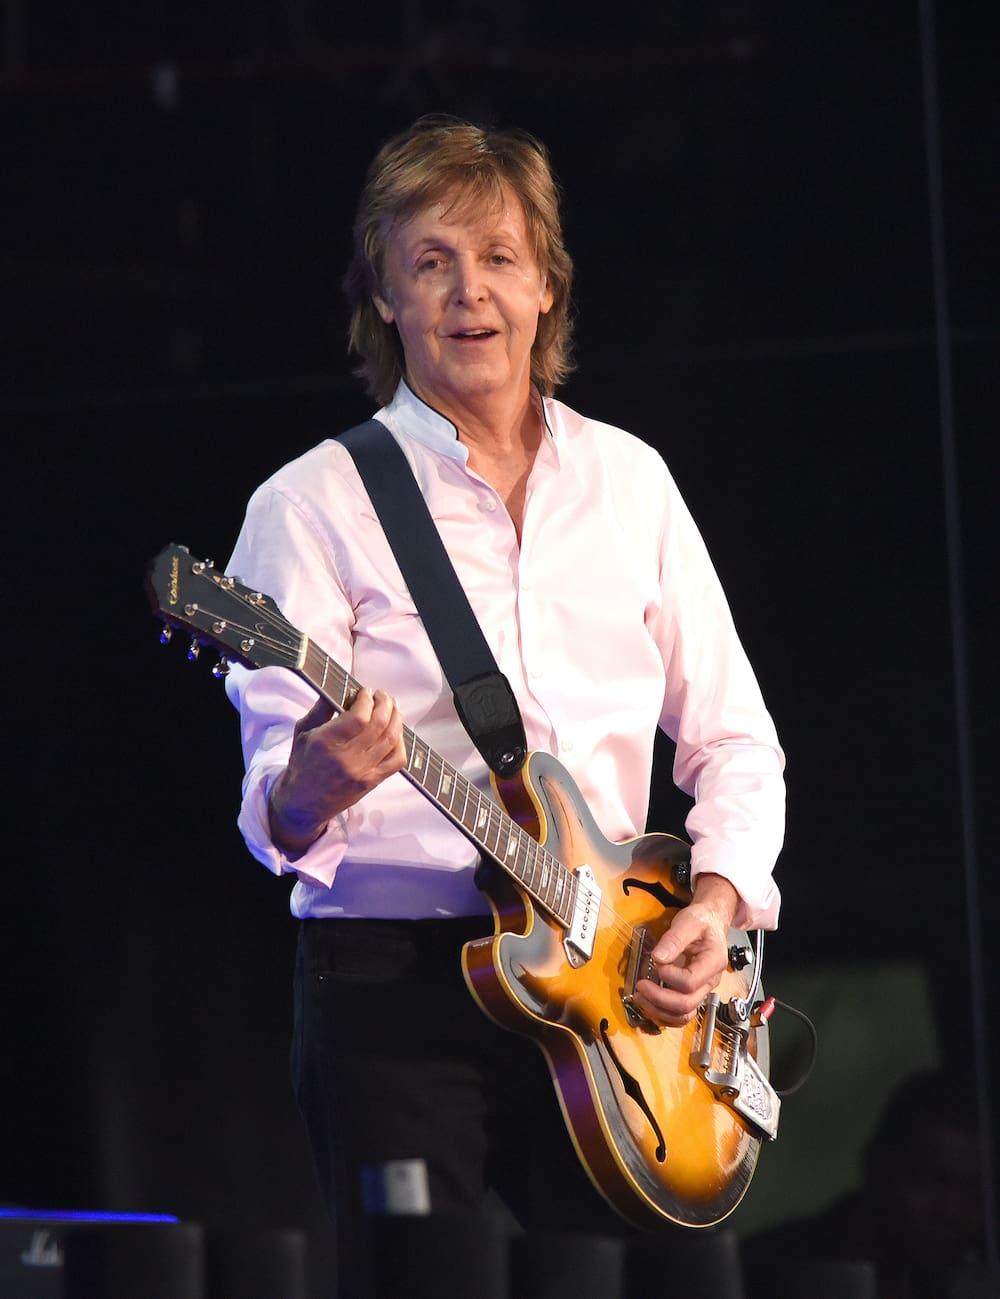 Beatles Star Paul Mccartney Auftritt In Fluch Der Karibik Blick